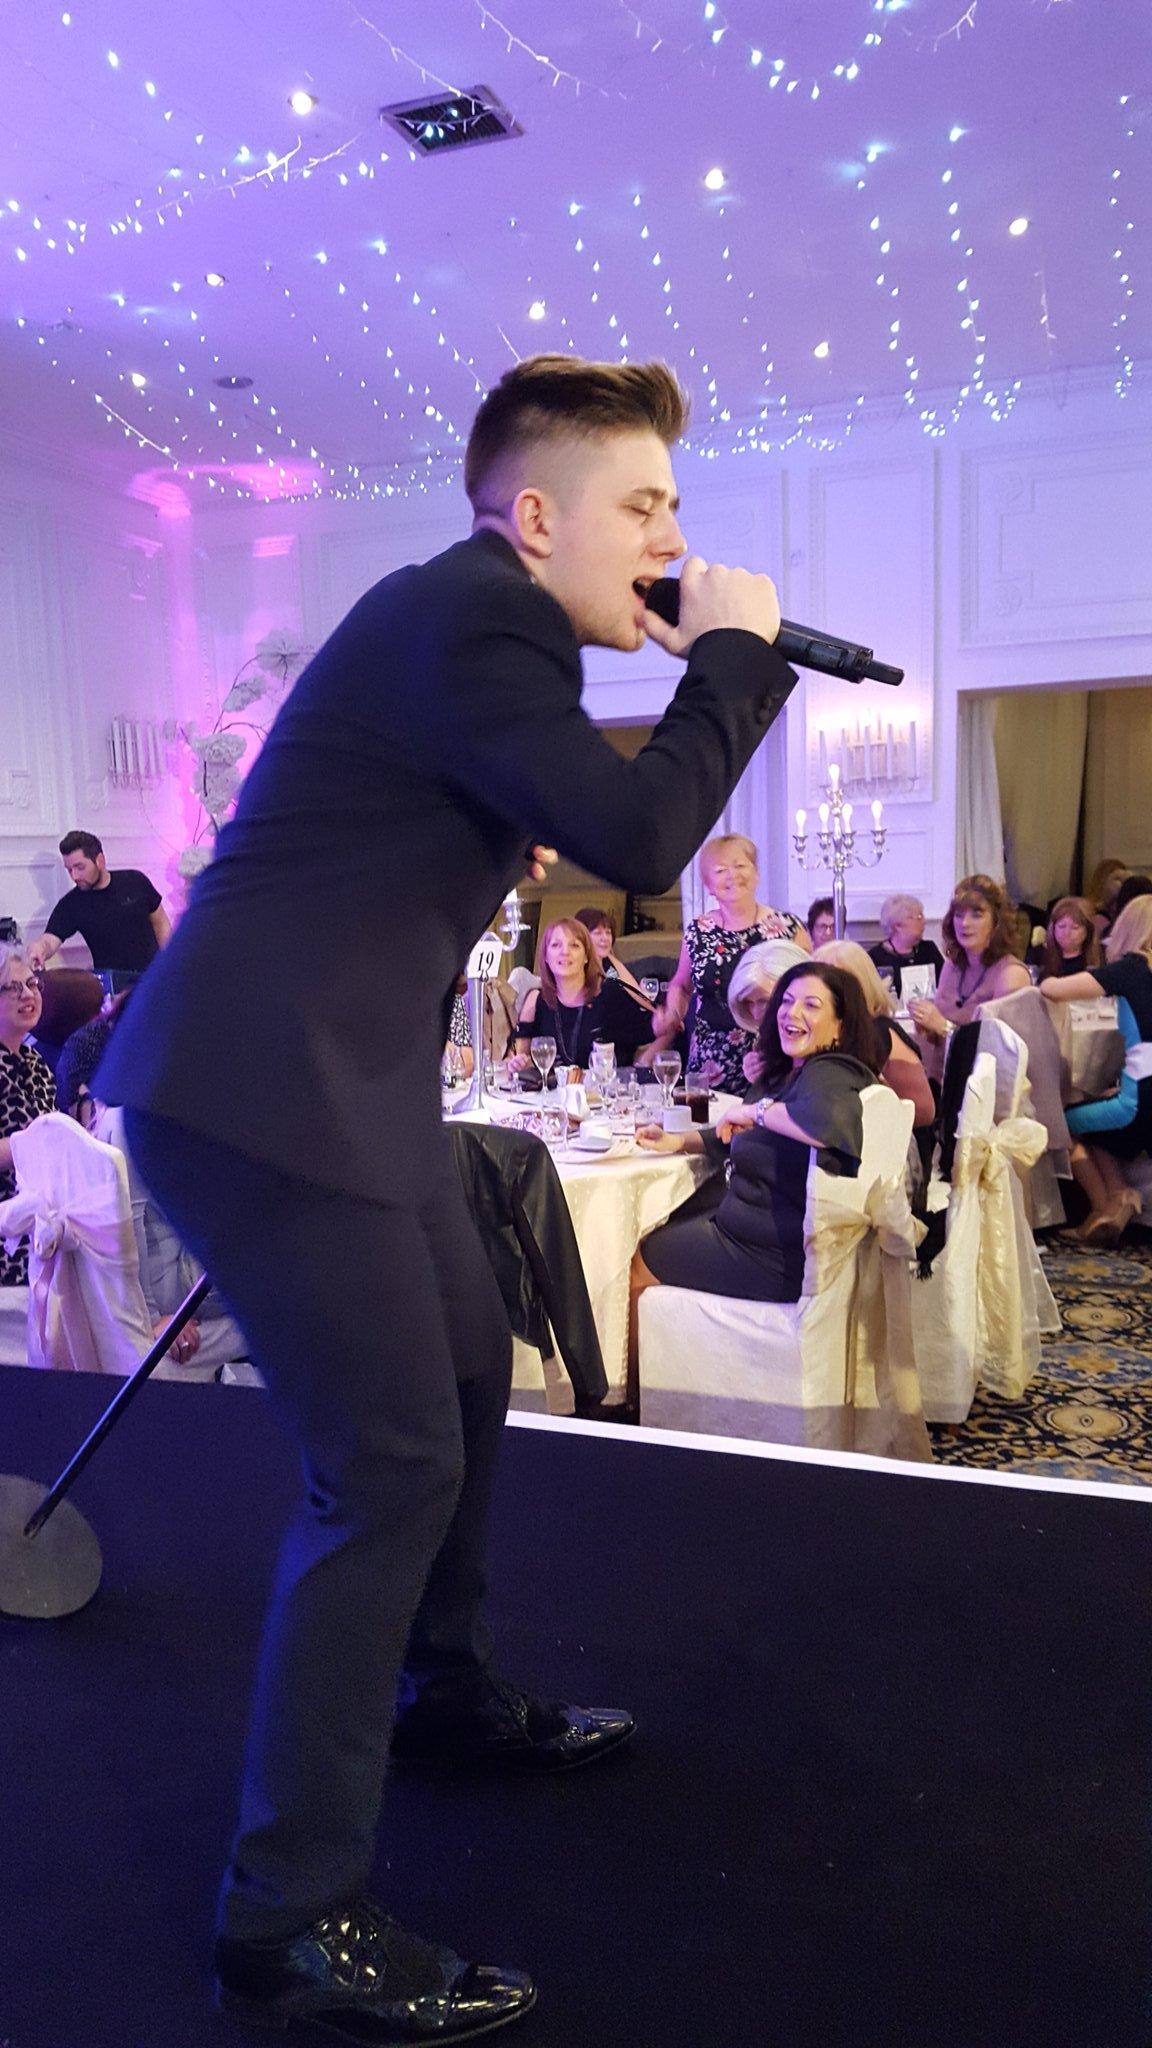 RT @StAndrewHospice: Nicholas Mcdonald entertaining our Ladies 🎶 https://t.co/kU6rT1mHXE